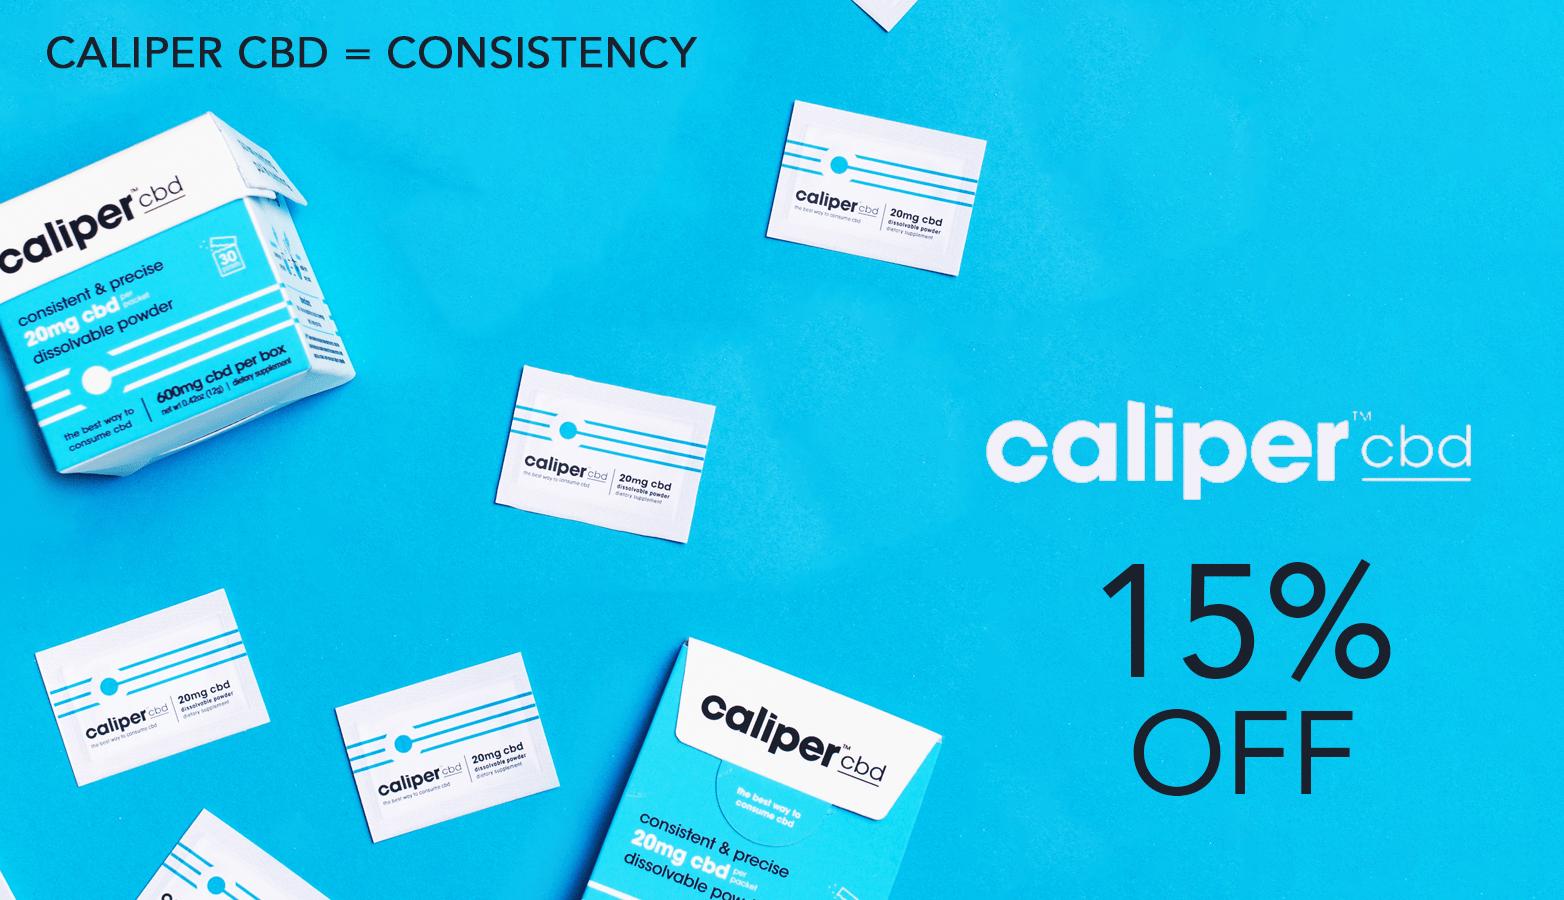 Caliper CBD Coupon Code Website